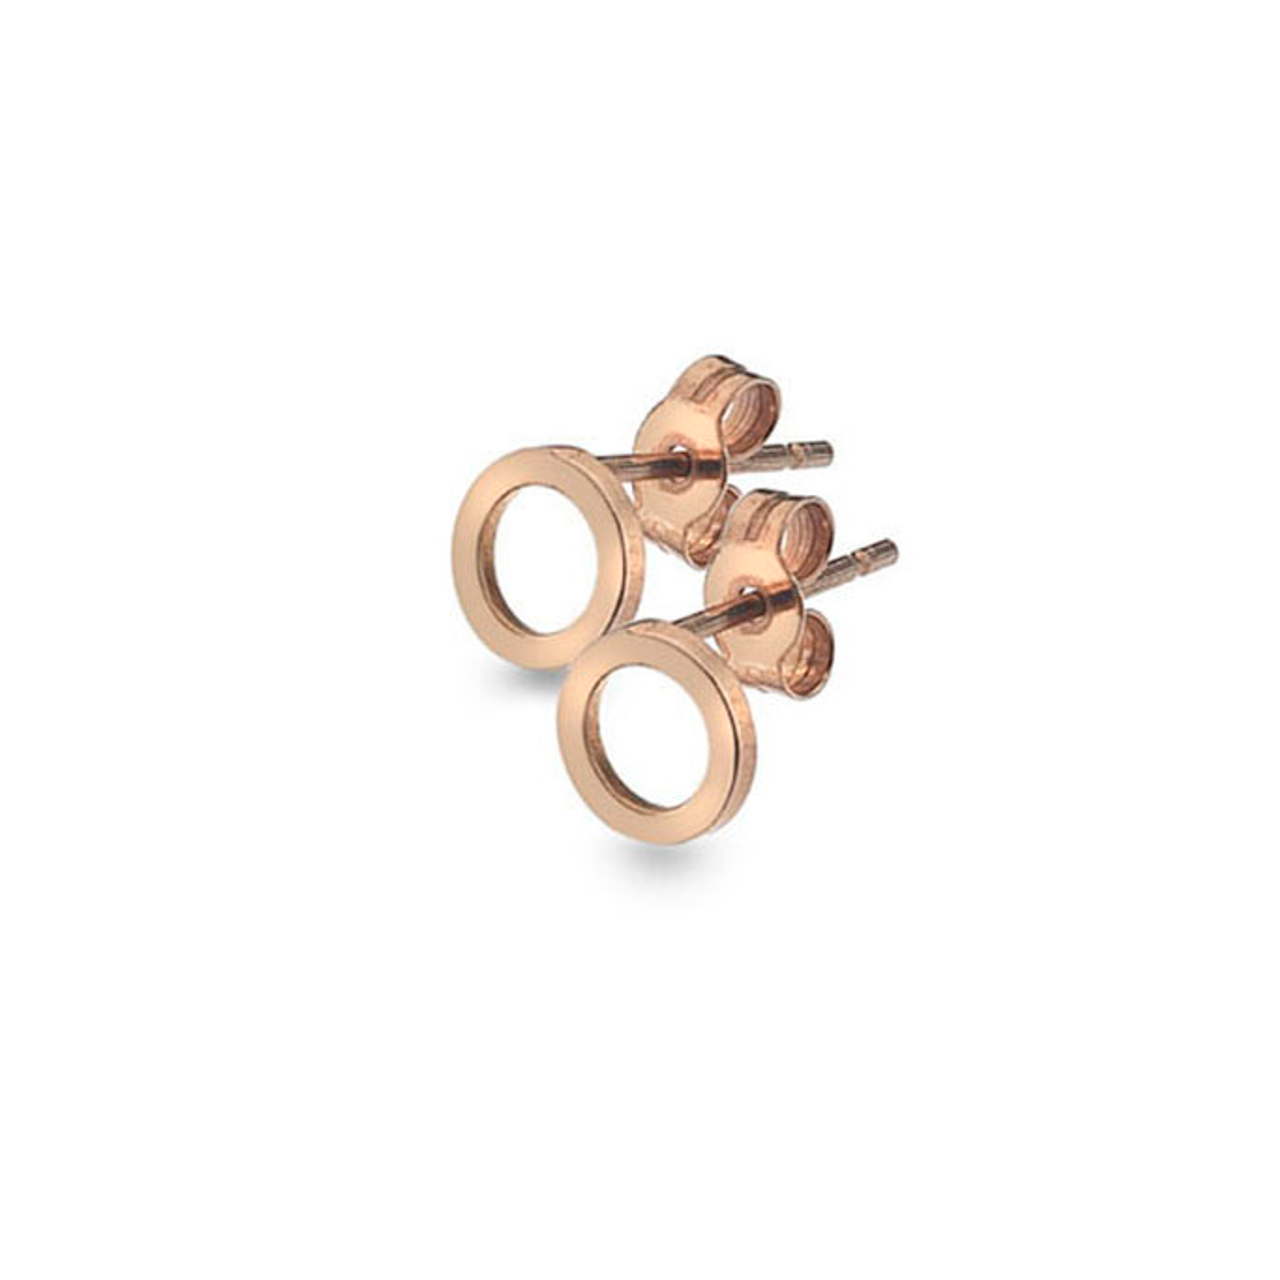 e0afef281 9ct Rose Gold open circle Stud Earrings - Hester Clarke